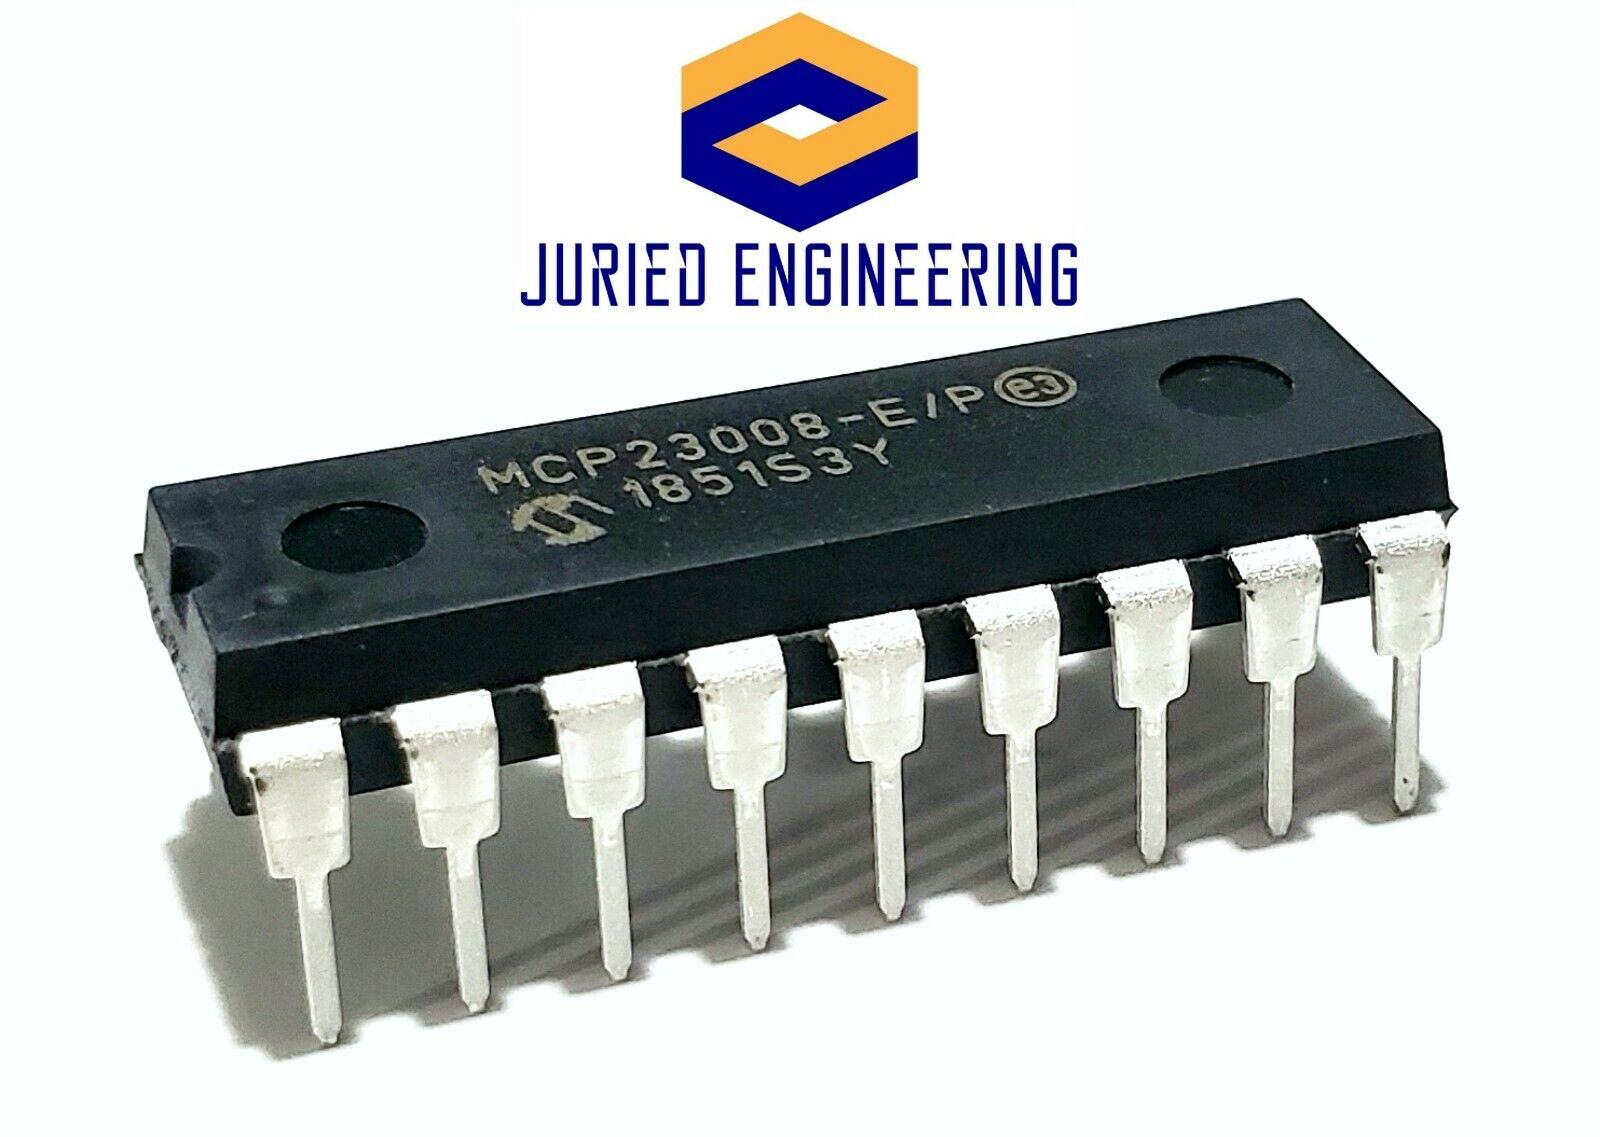 1Pcs MCP23008-E//P MCP23008 DIP18